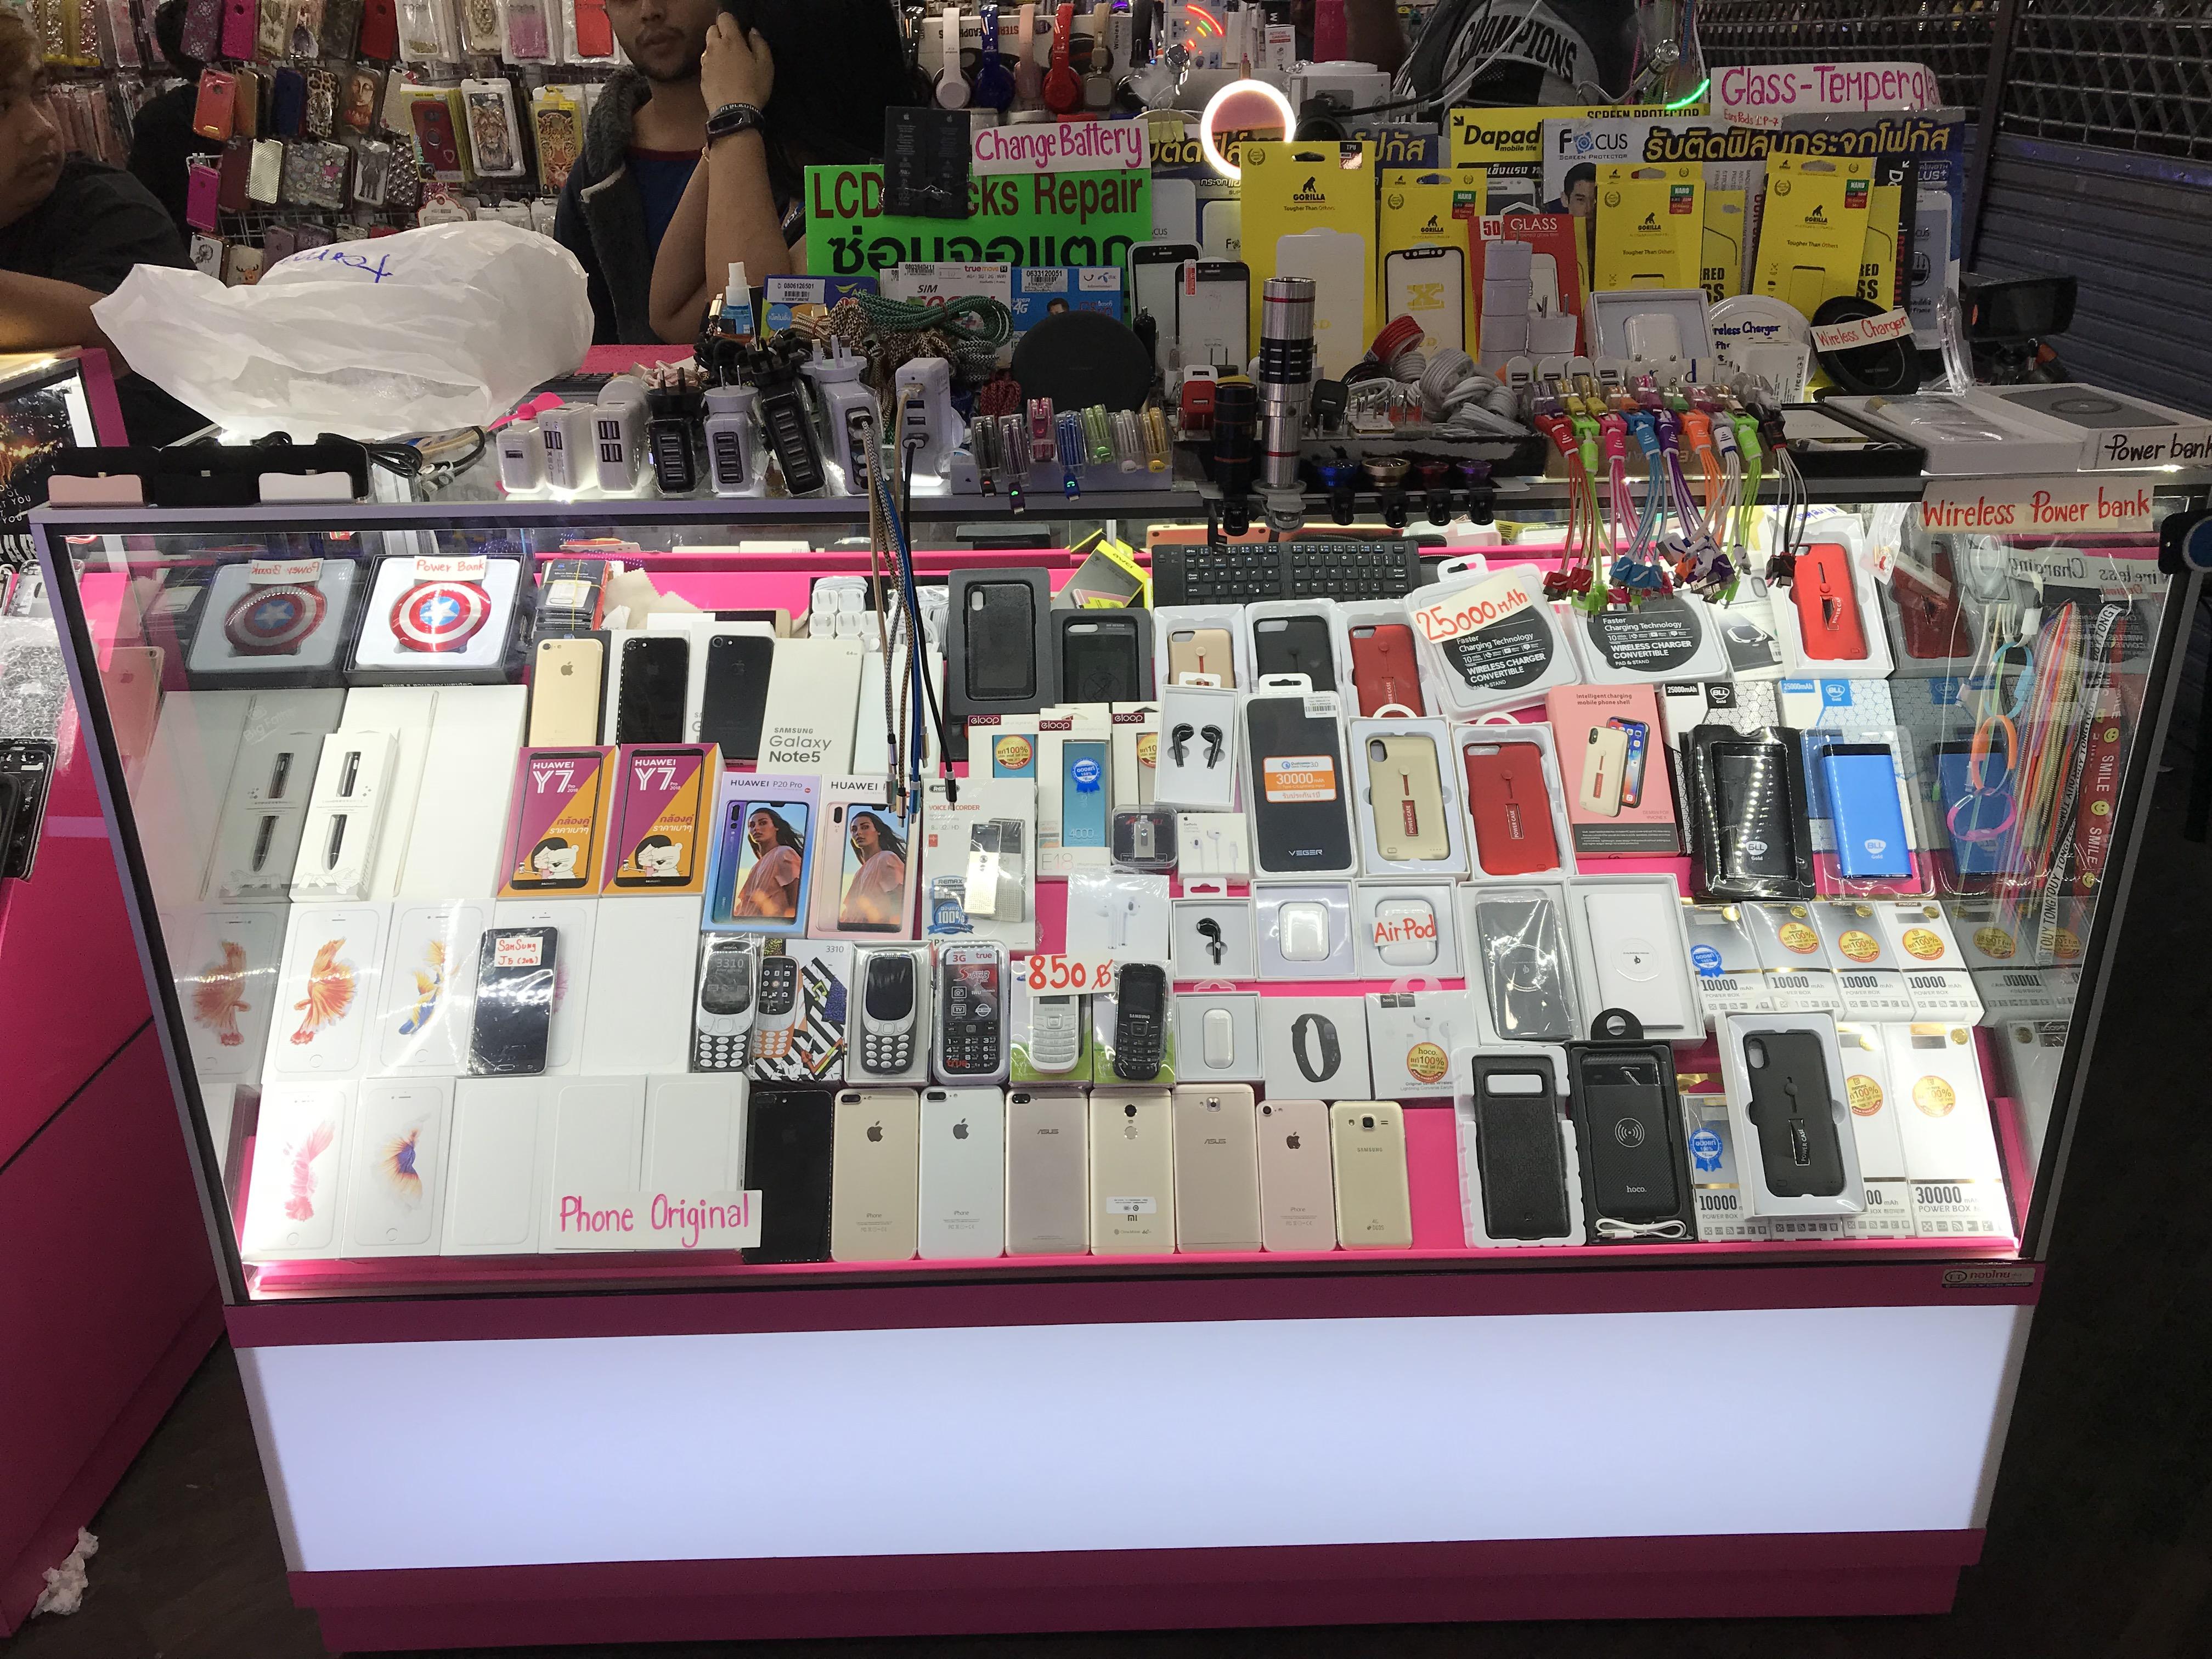 MBK iPhone